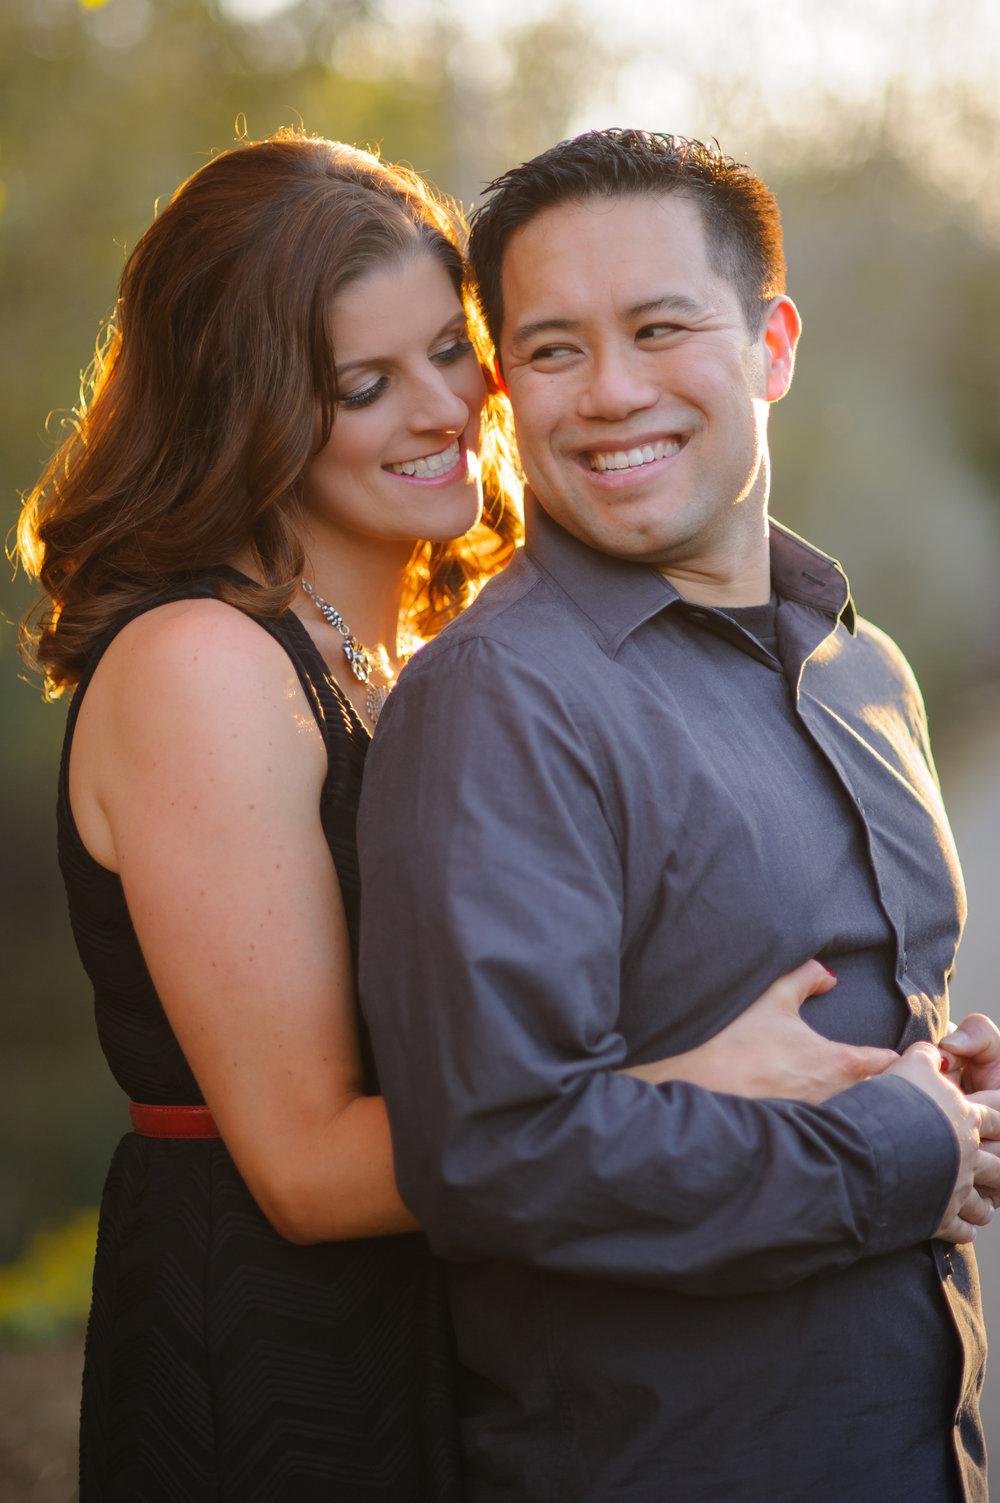 susan-brad-012-uc-davis-engagement-wedding-photographer-katherine-nicole-photography.JPG